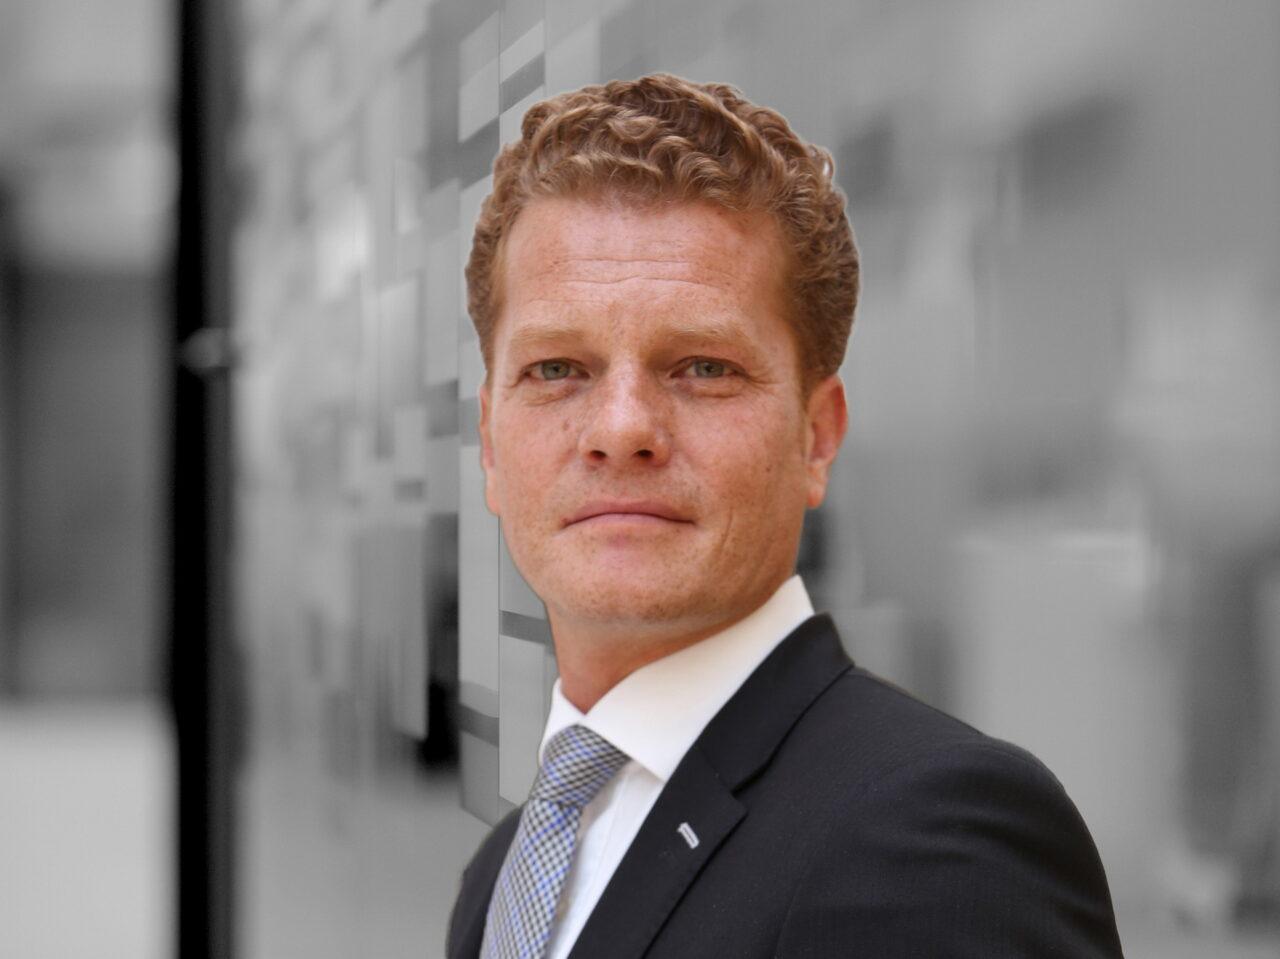 https://intelligent-investors.de/wp-content/uploads/2021/06/OFI-AM-Eric-Bertrand_2-1280x959.jpg